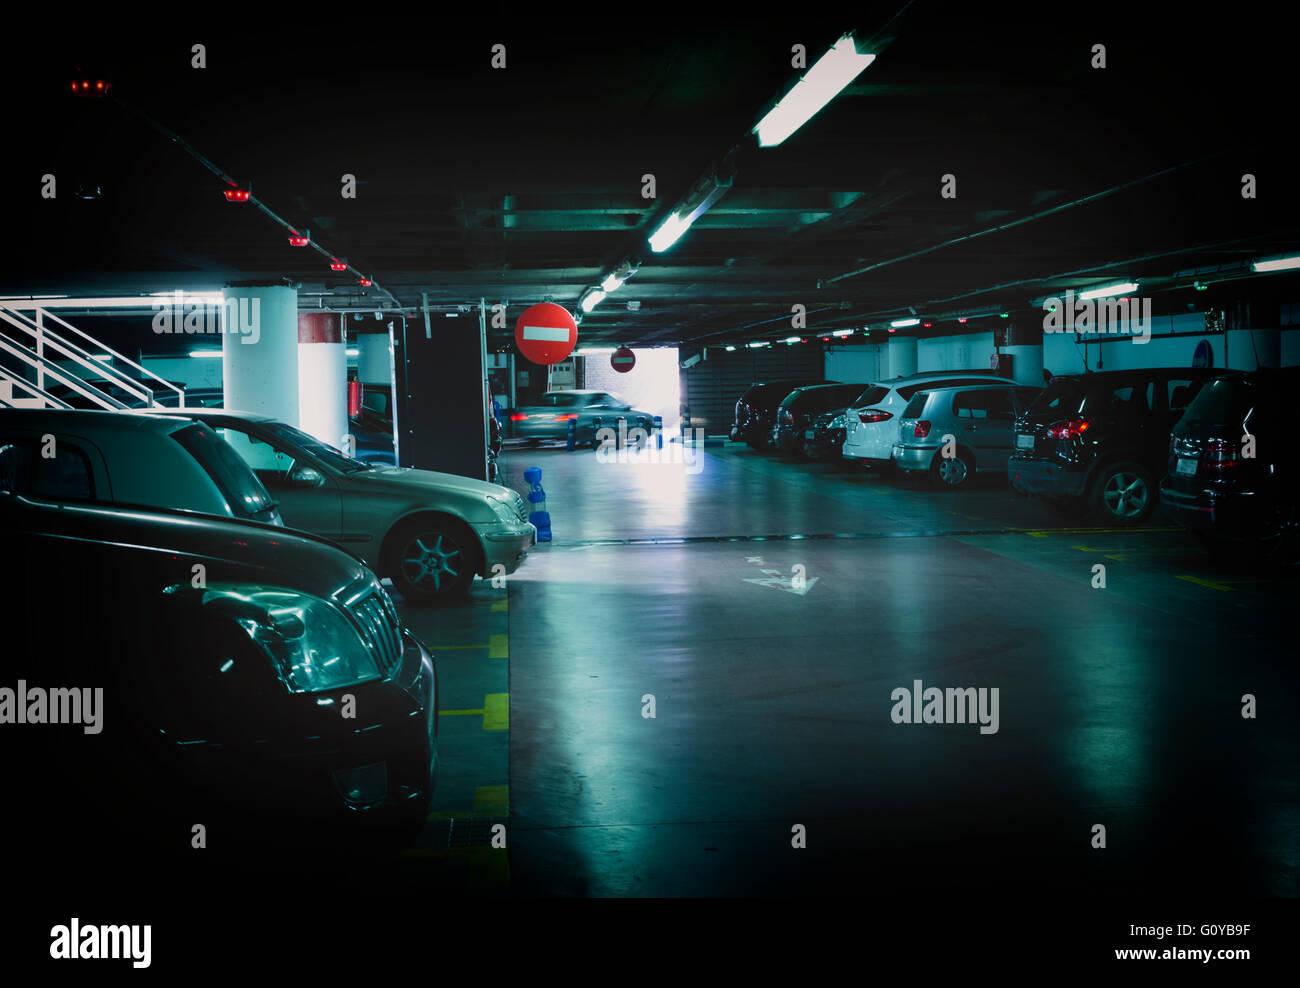 Undergound parking garage, Malaga, Spain.  This is the Plaza de la Marina garage. - Stock Image